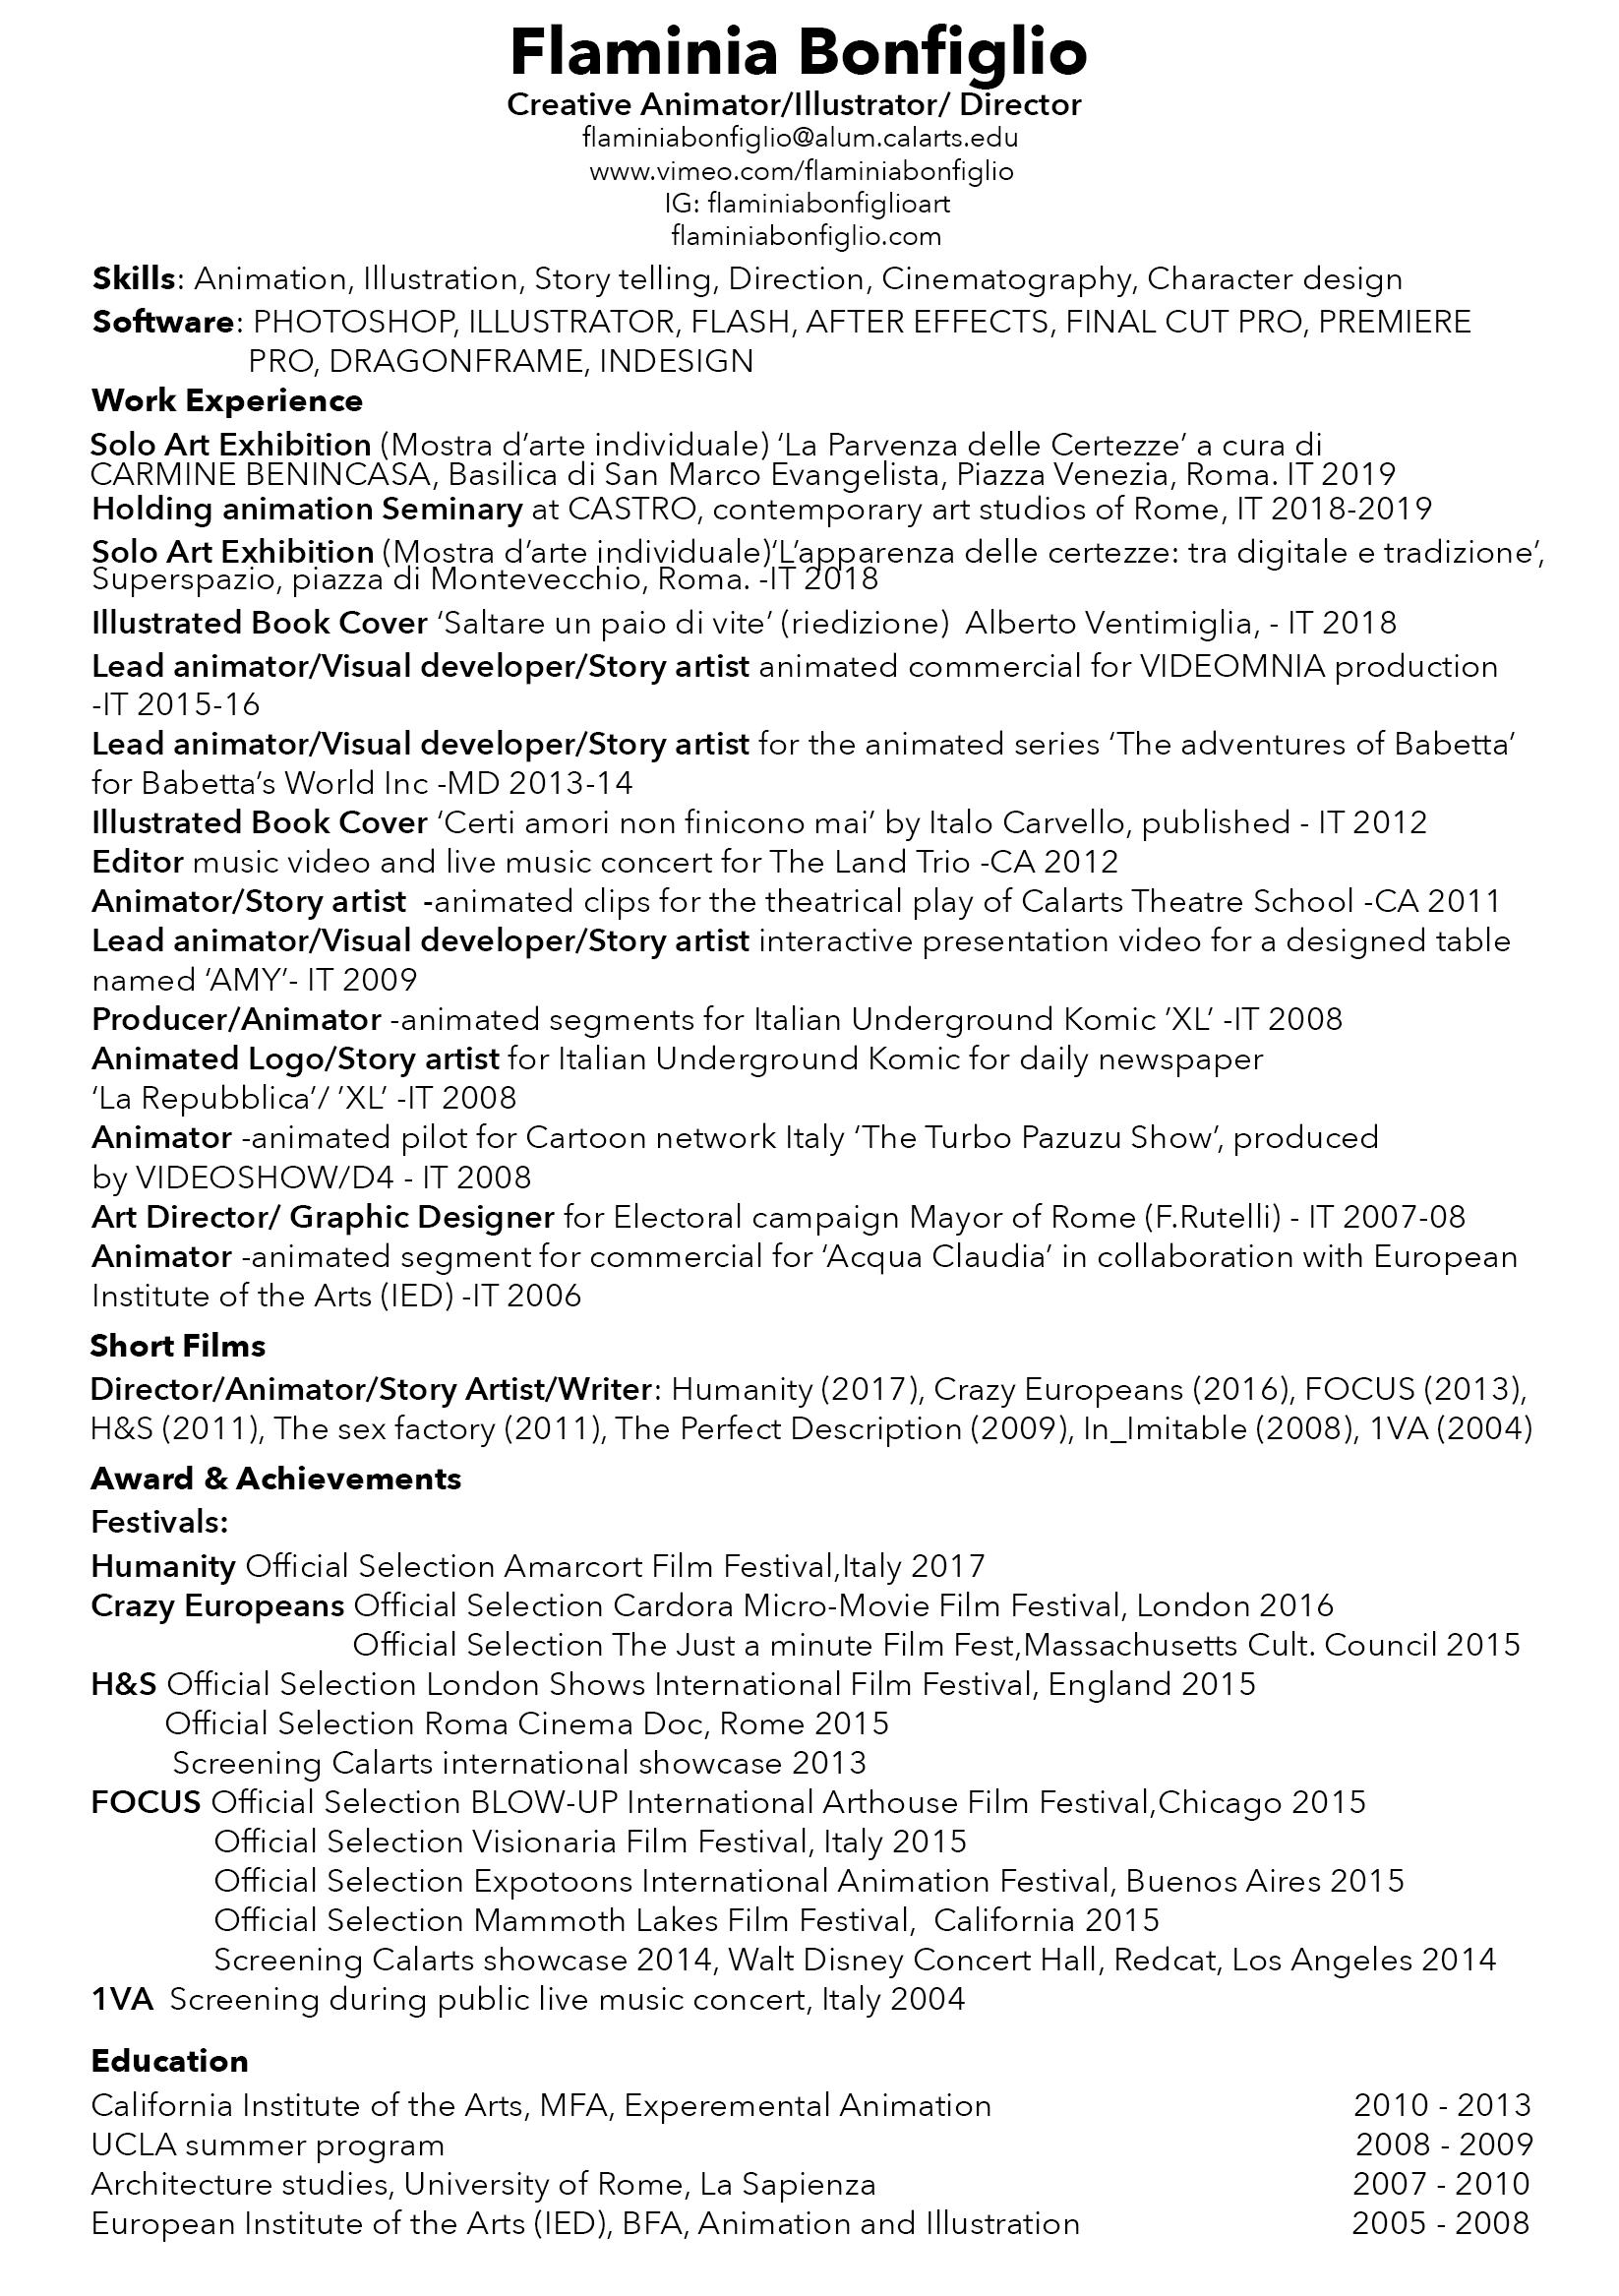 Resume 2019